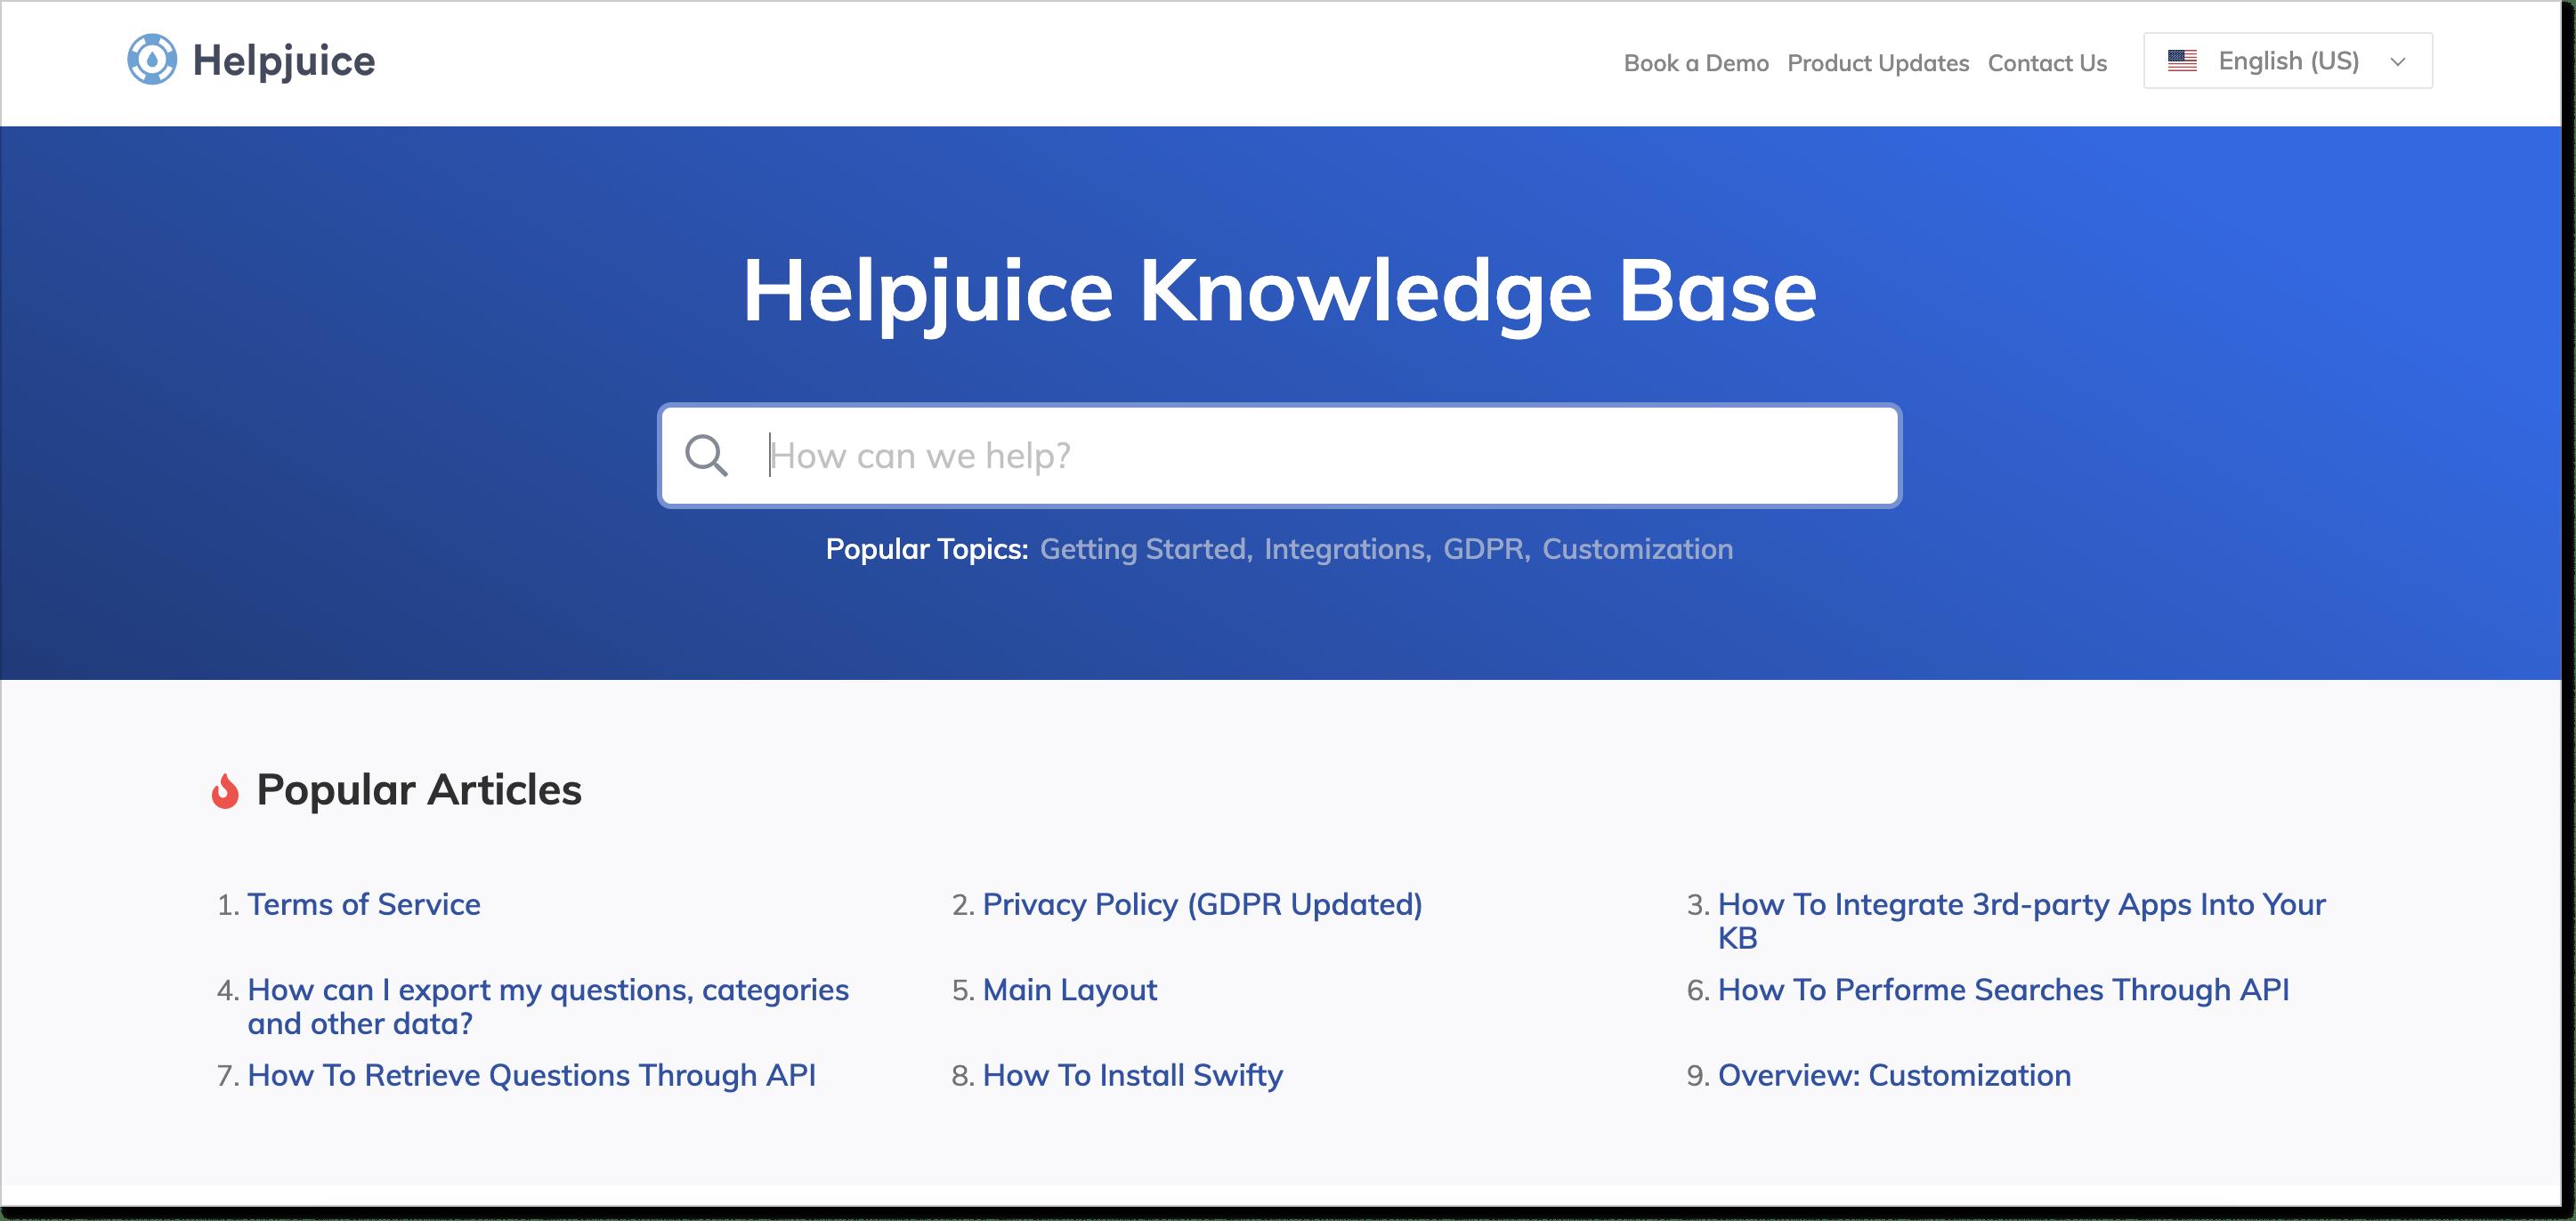 Helpjuice knowledge management software